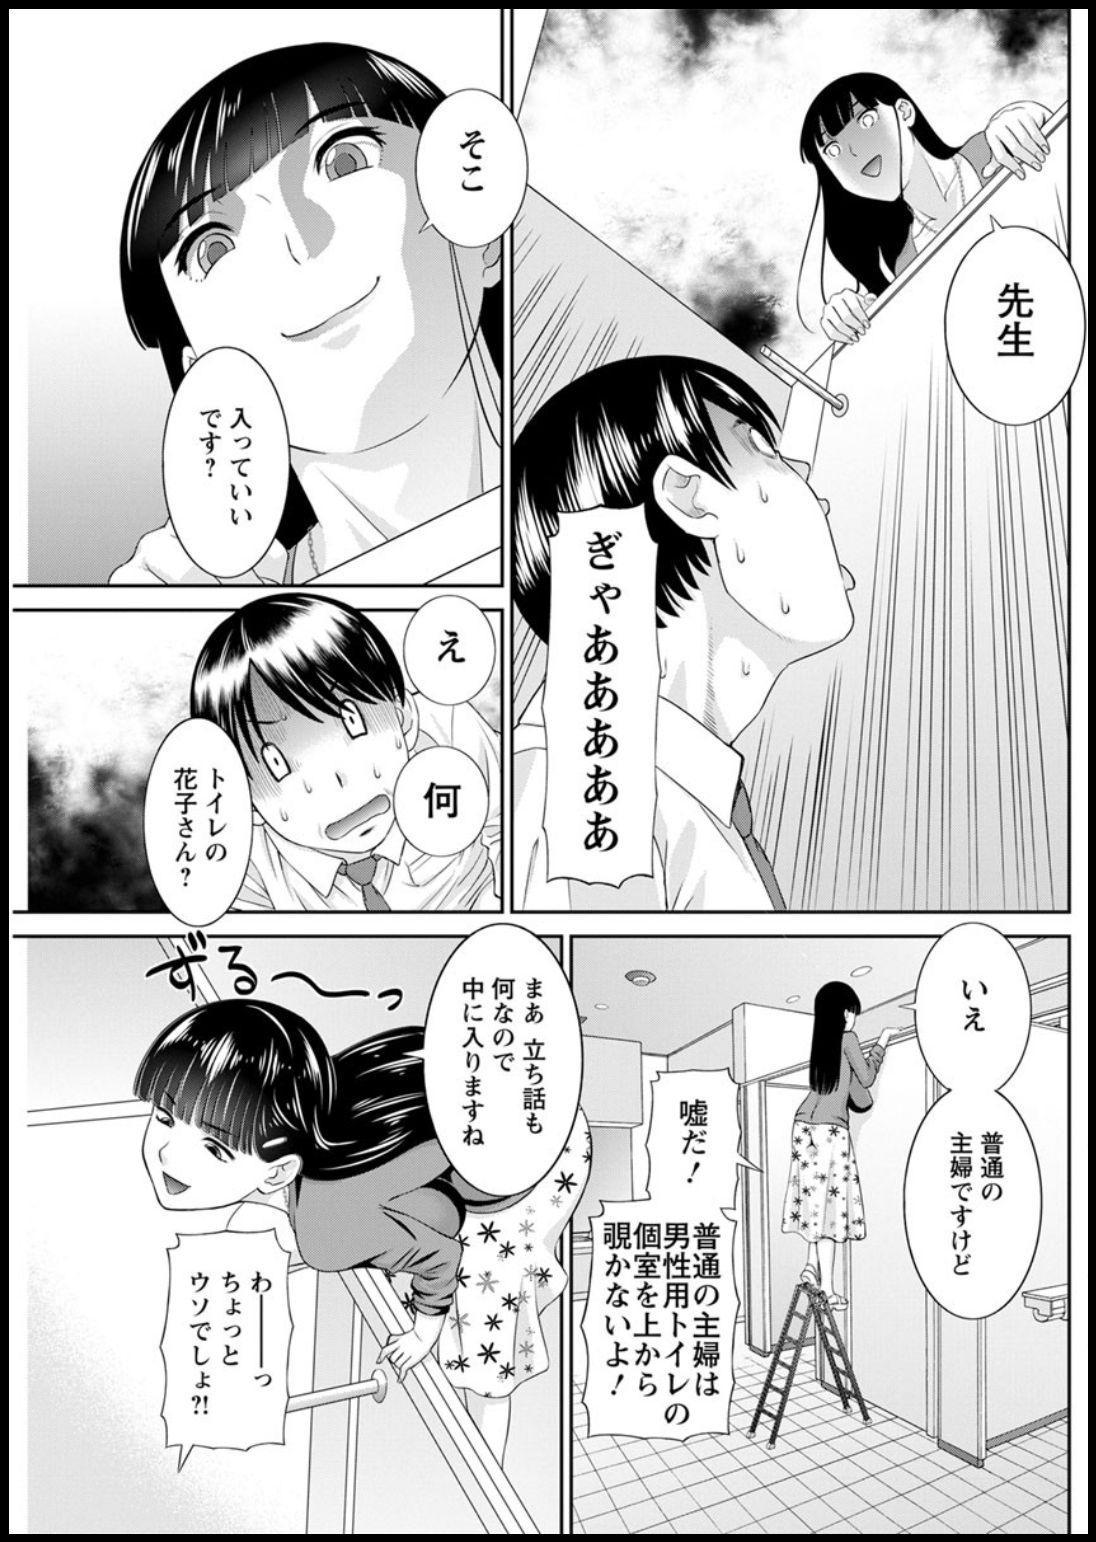 [Kawamori Misaki] Kaikan Hitotsuma Gakuen Ch. 1-6, 8-20 [Digital] 174